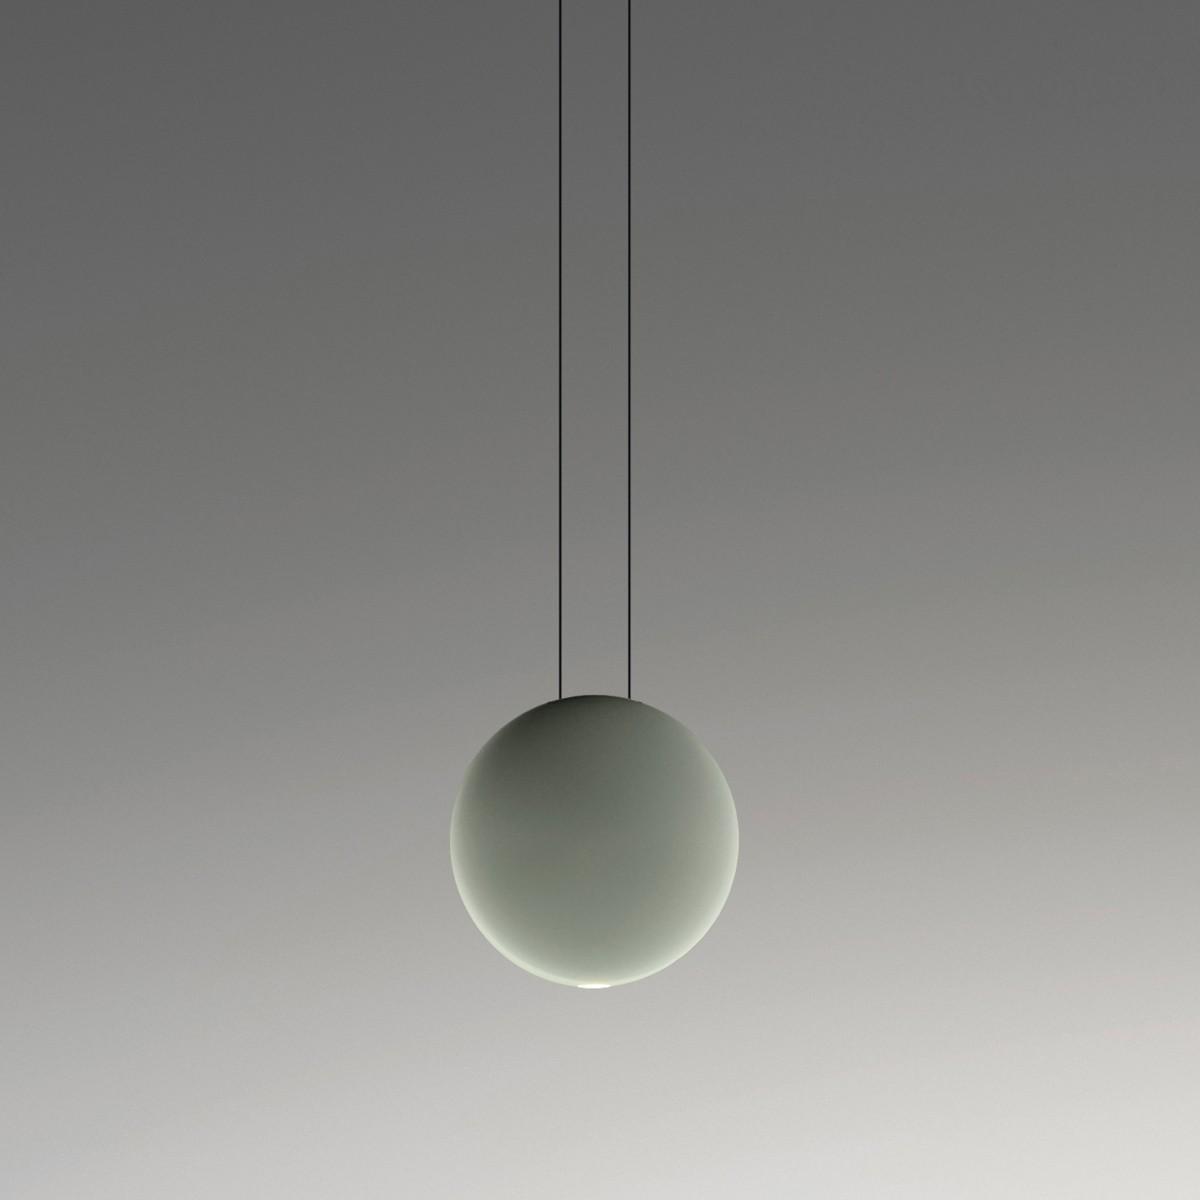 Vibia Cosmos 2501 Pendelleuchte, grün matt, dimmbar